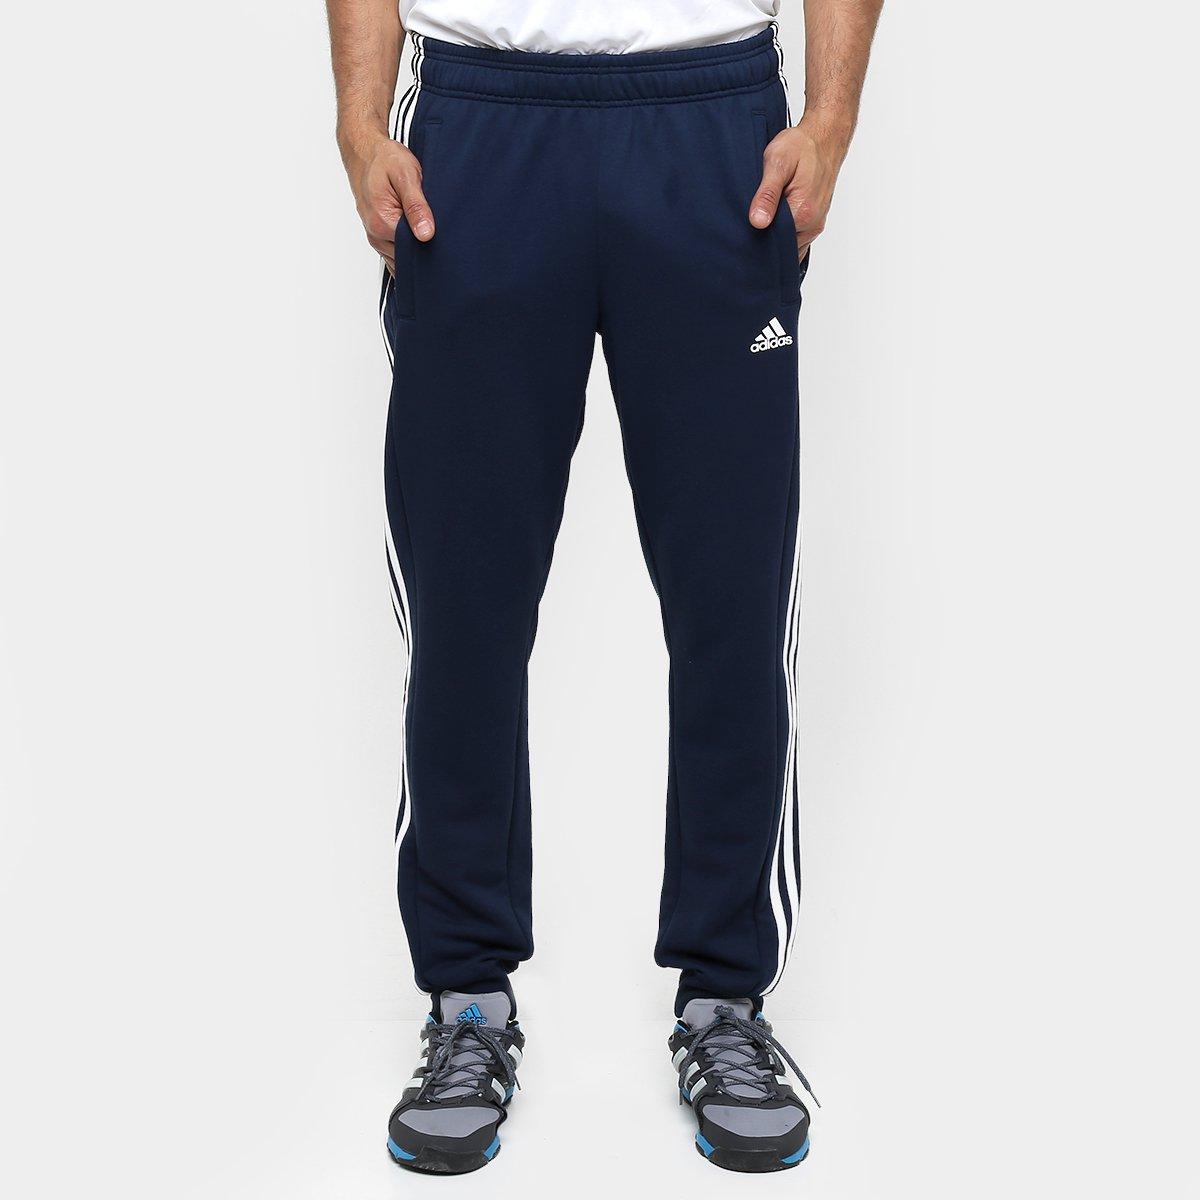 Calça Adidas Originals Tap Auth 1 0 | Netshoes